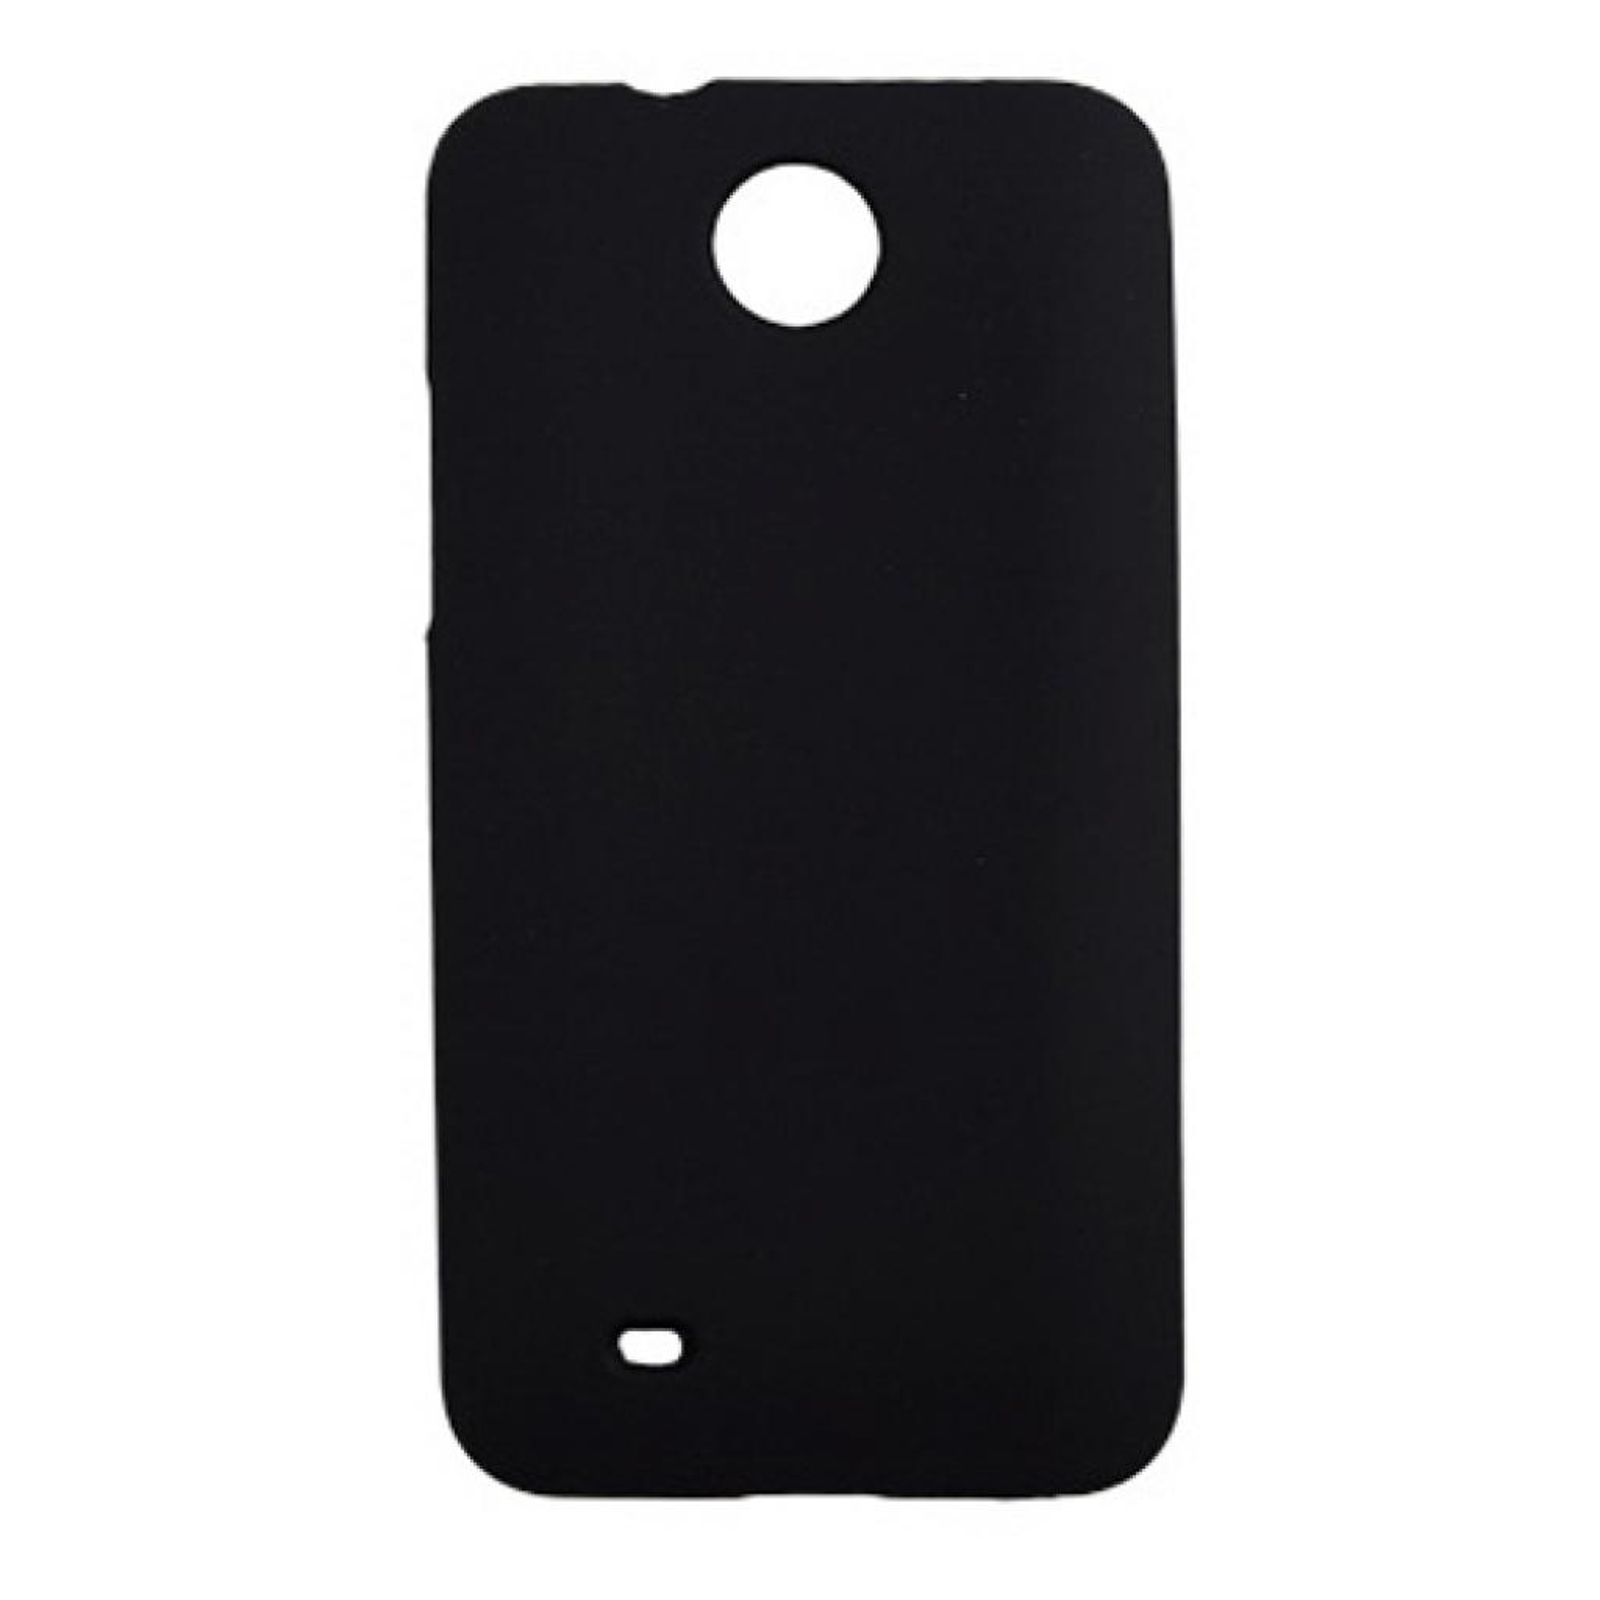 Чехол для моб. телефона Drobak для HTC Desire 300 /ElasticPU/Black (218861)